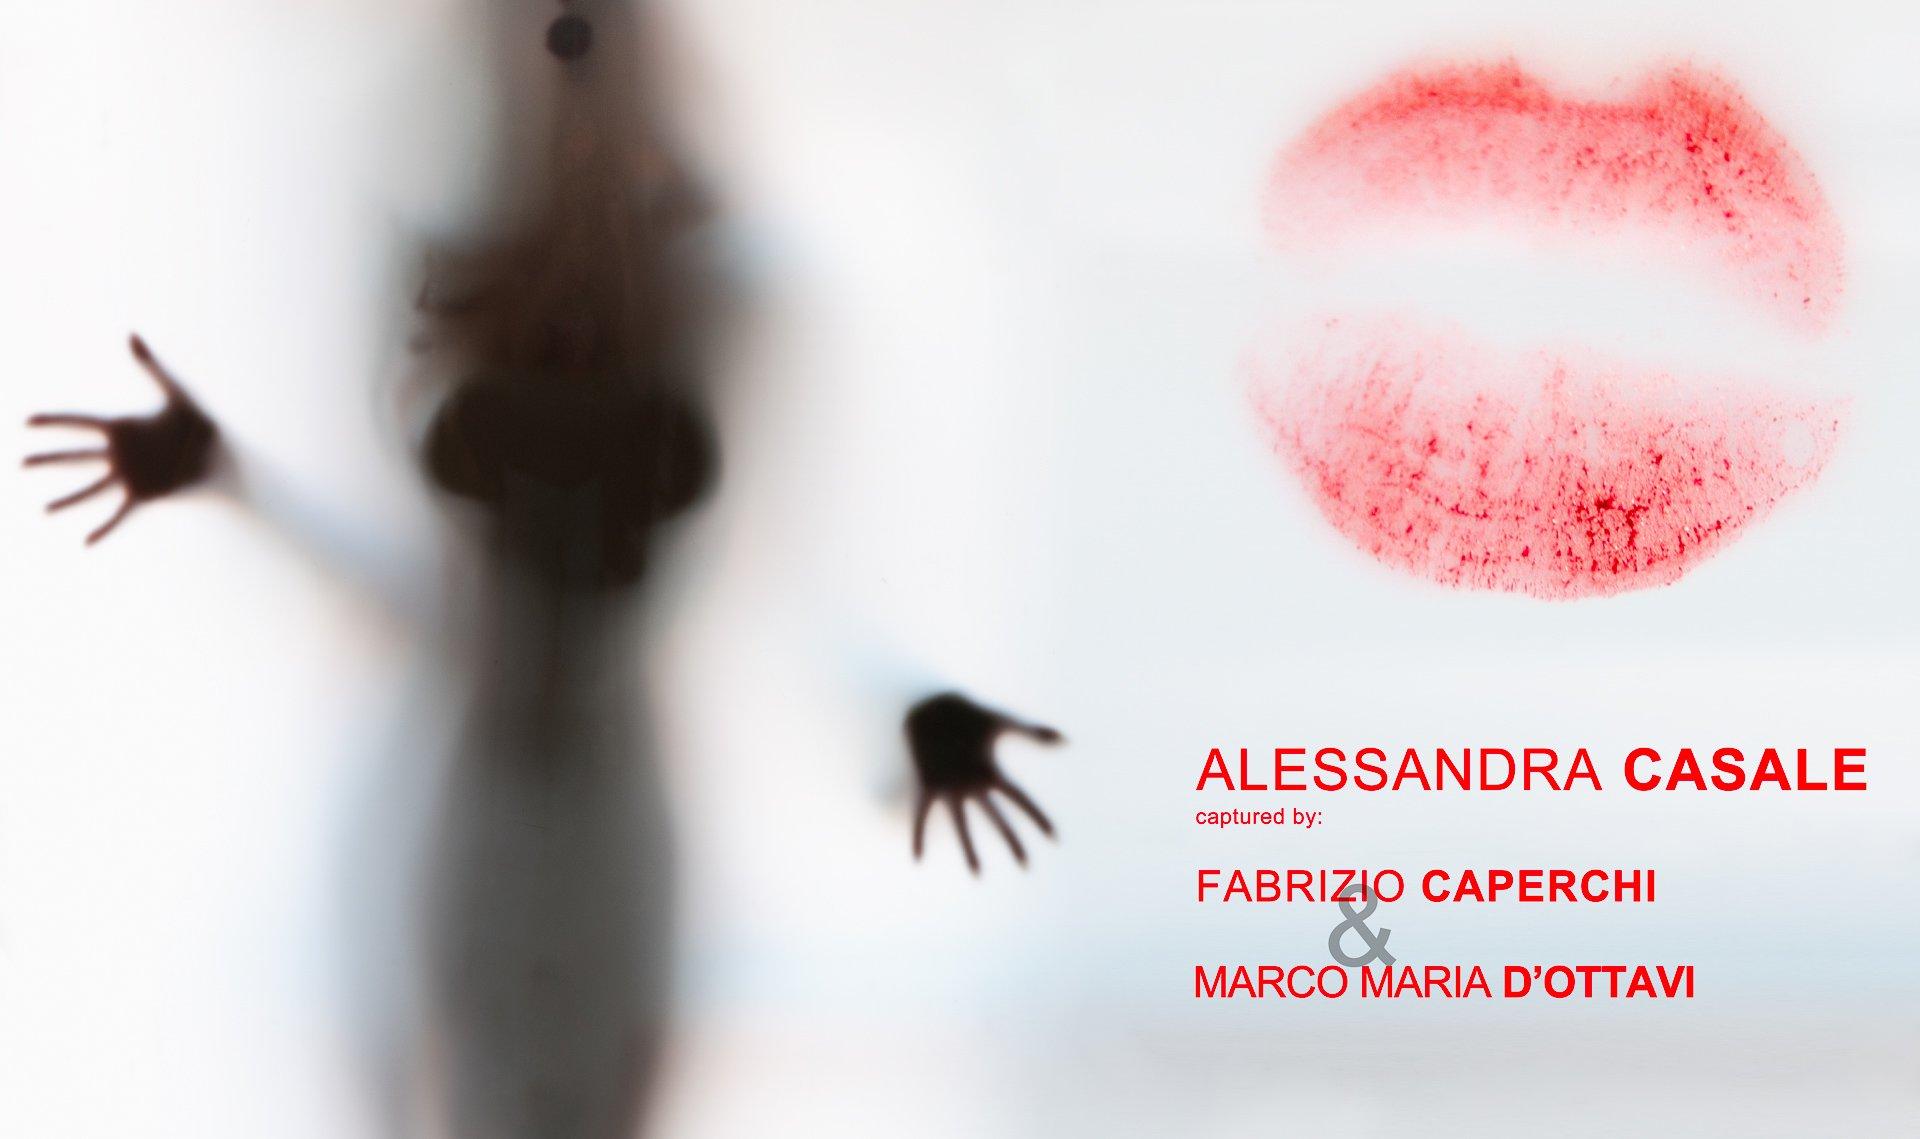 Alessandra Casale